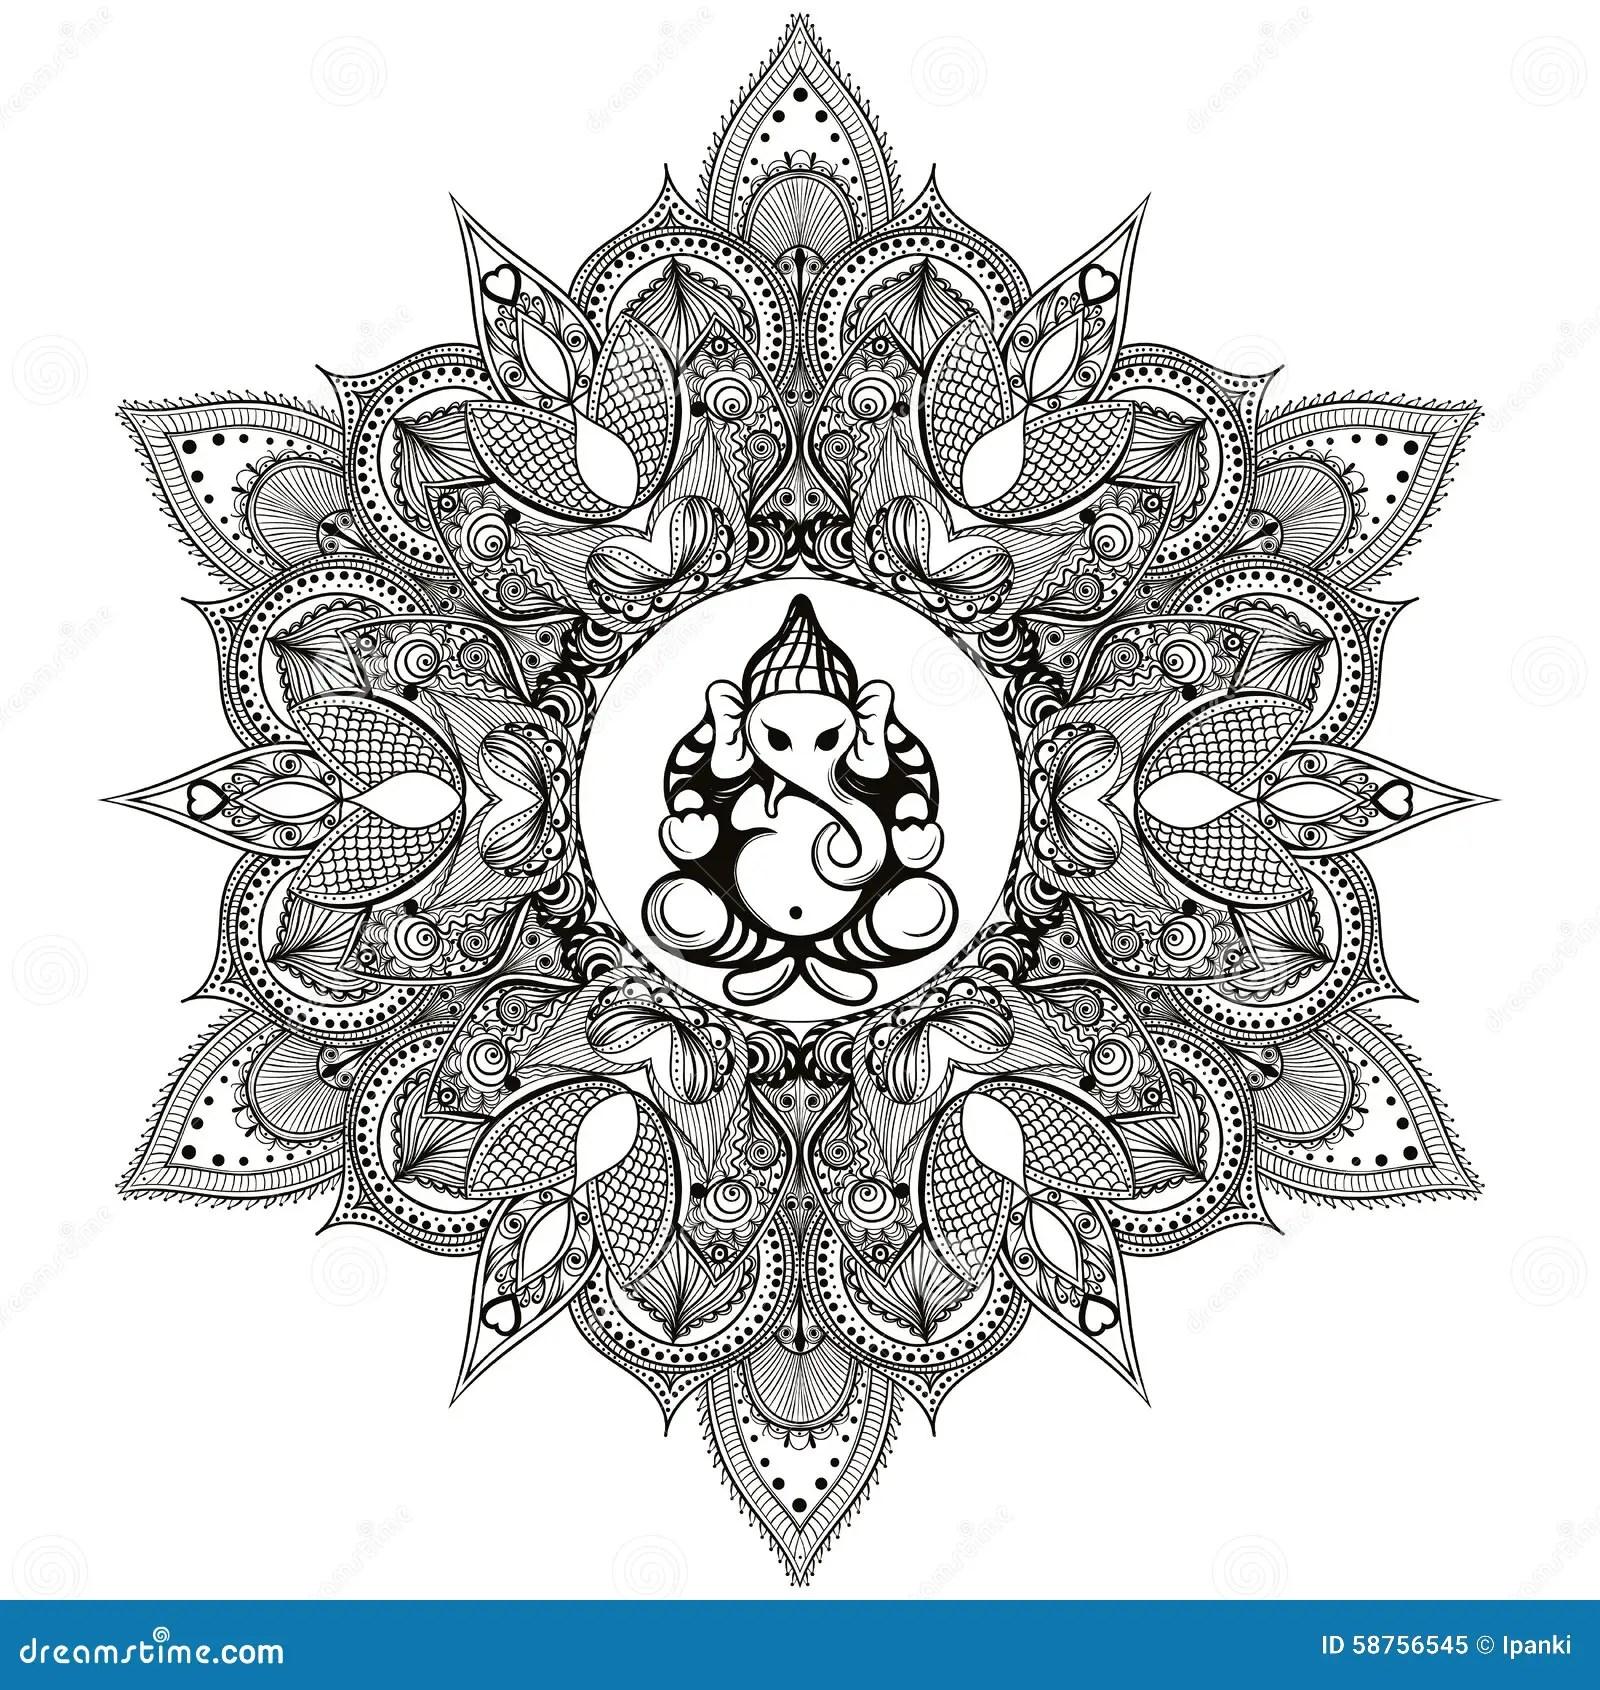 Zentangle Stylized Round Indian Mandala With Hindu